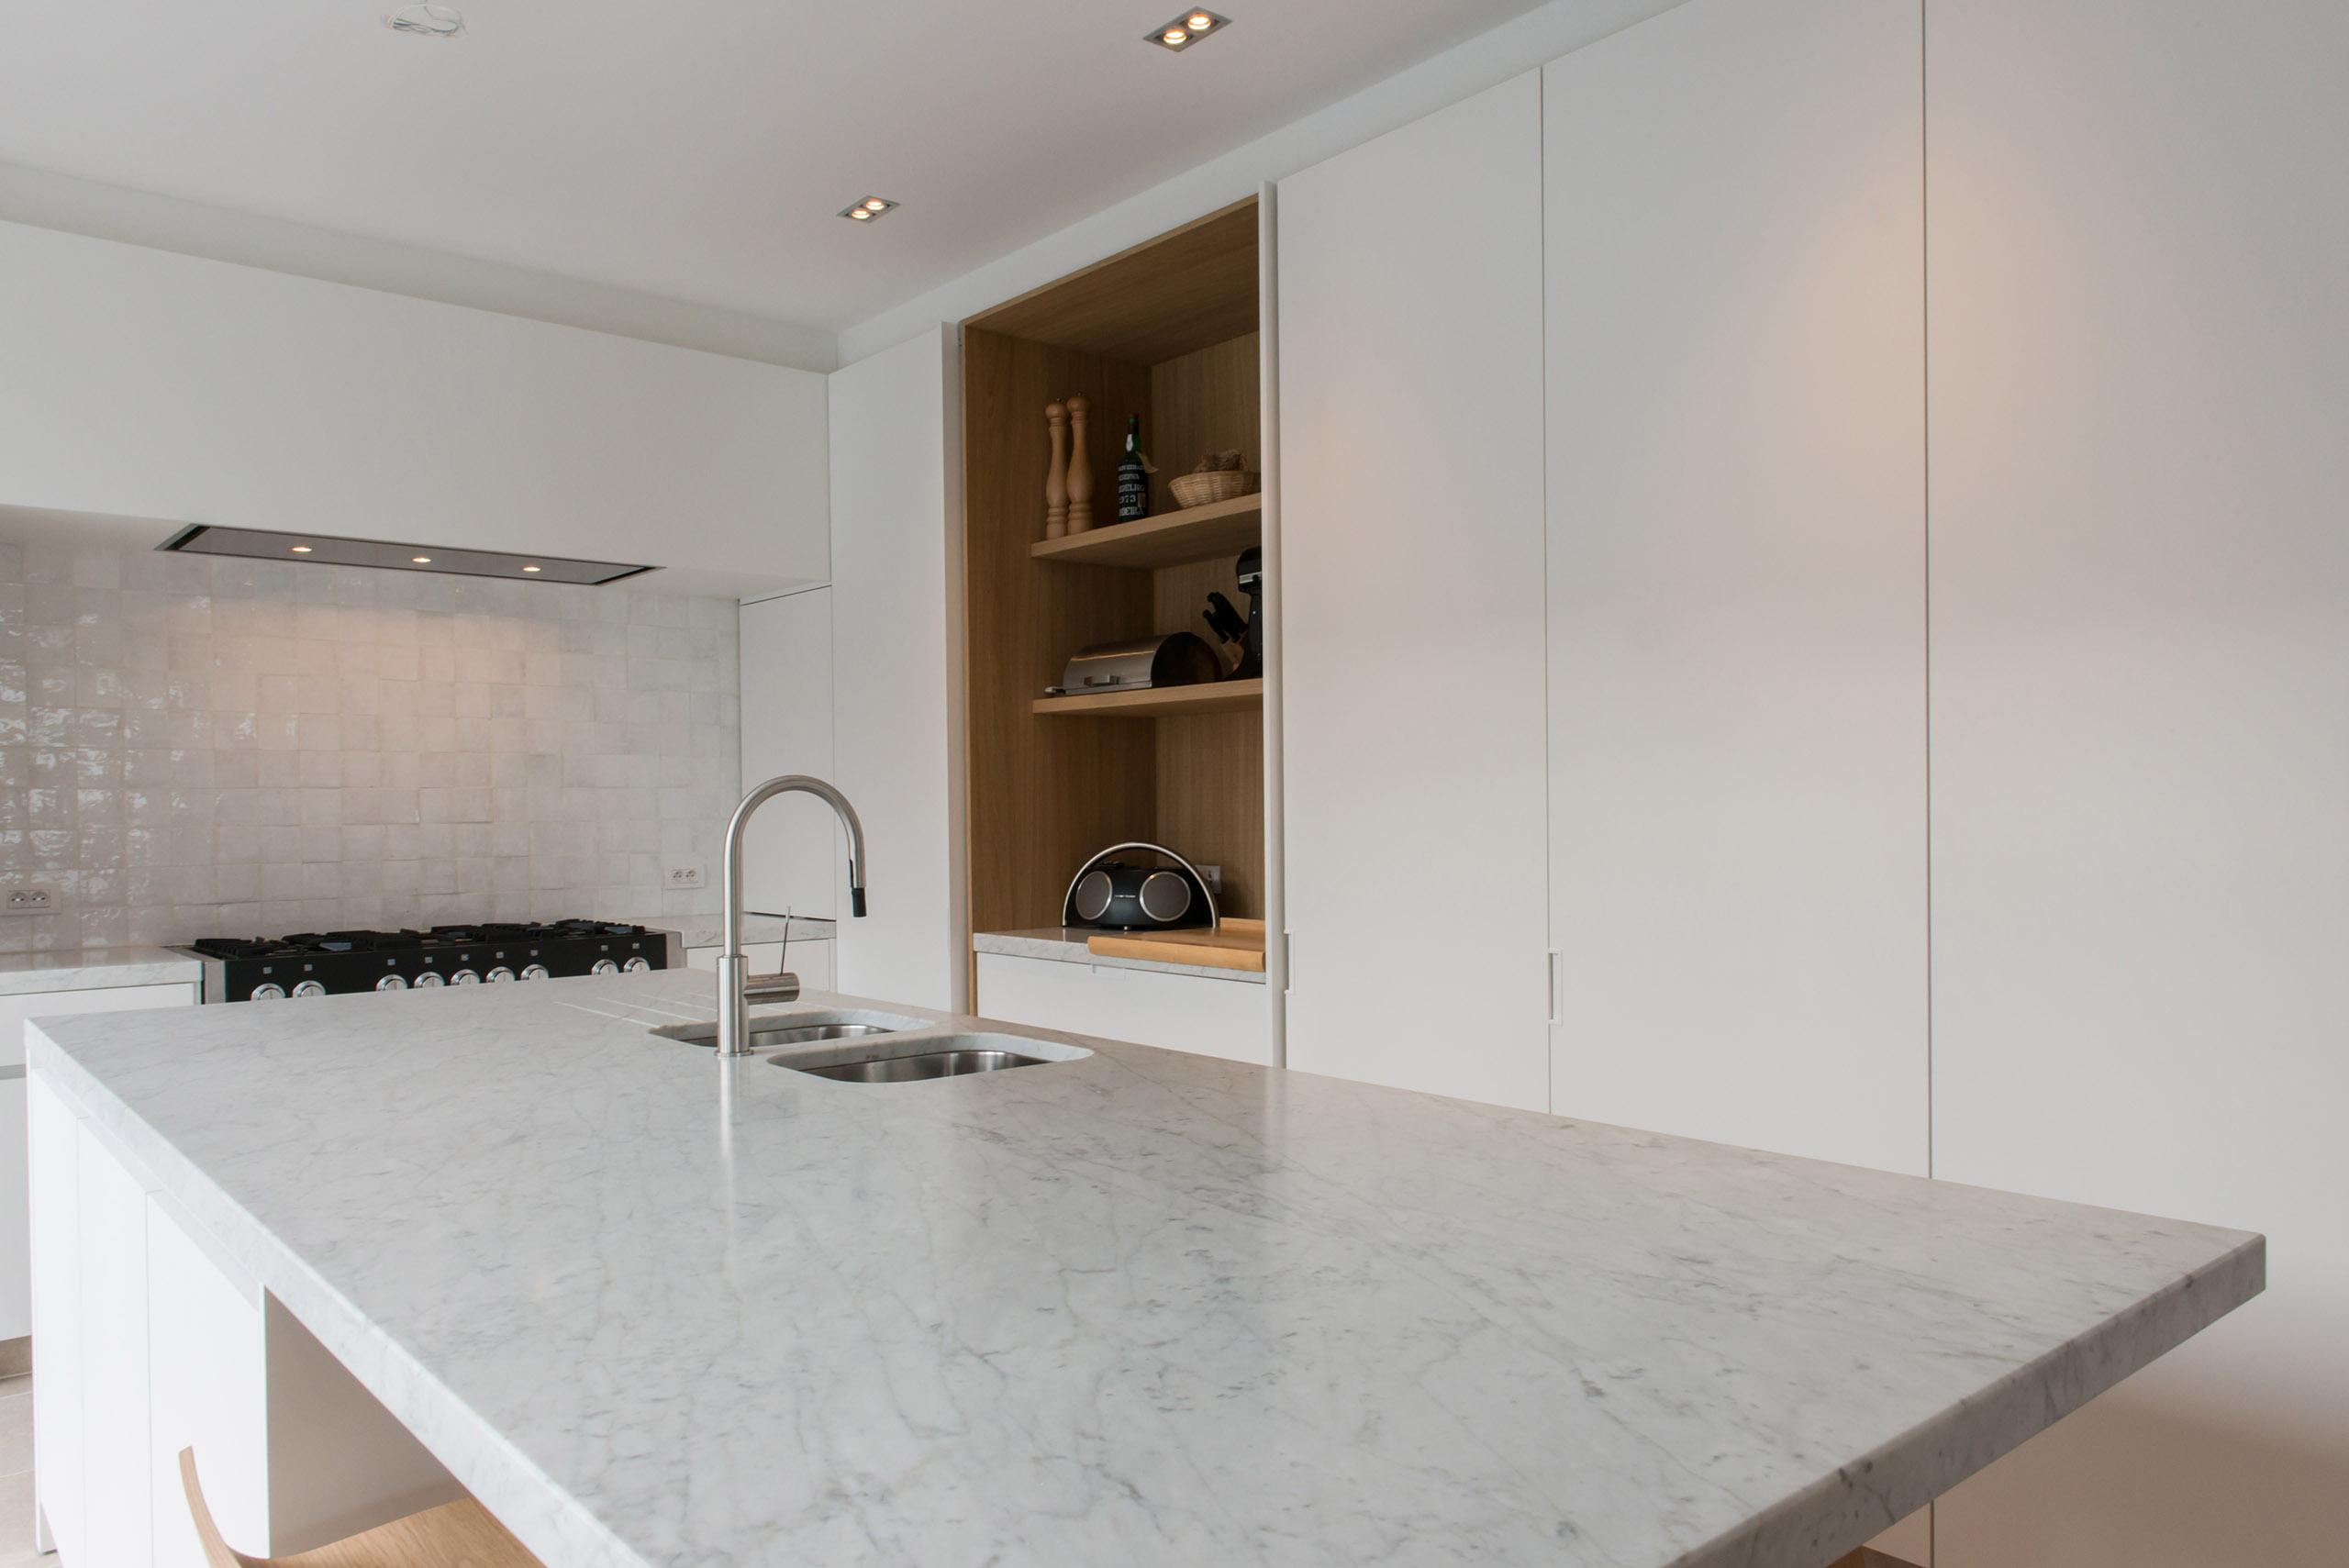 Strakke Witte Keuken In Oisterwijk : Tijdloze strakke keuken met ...